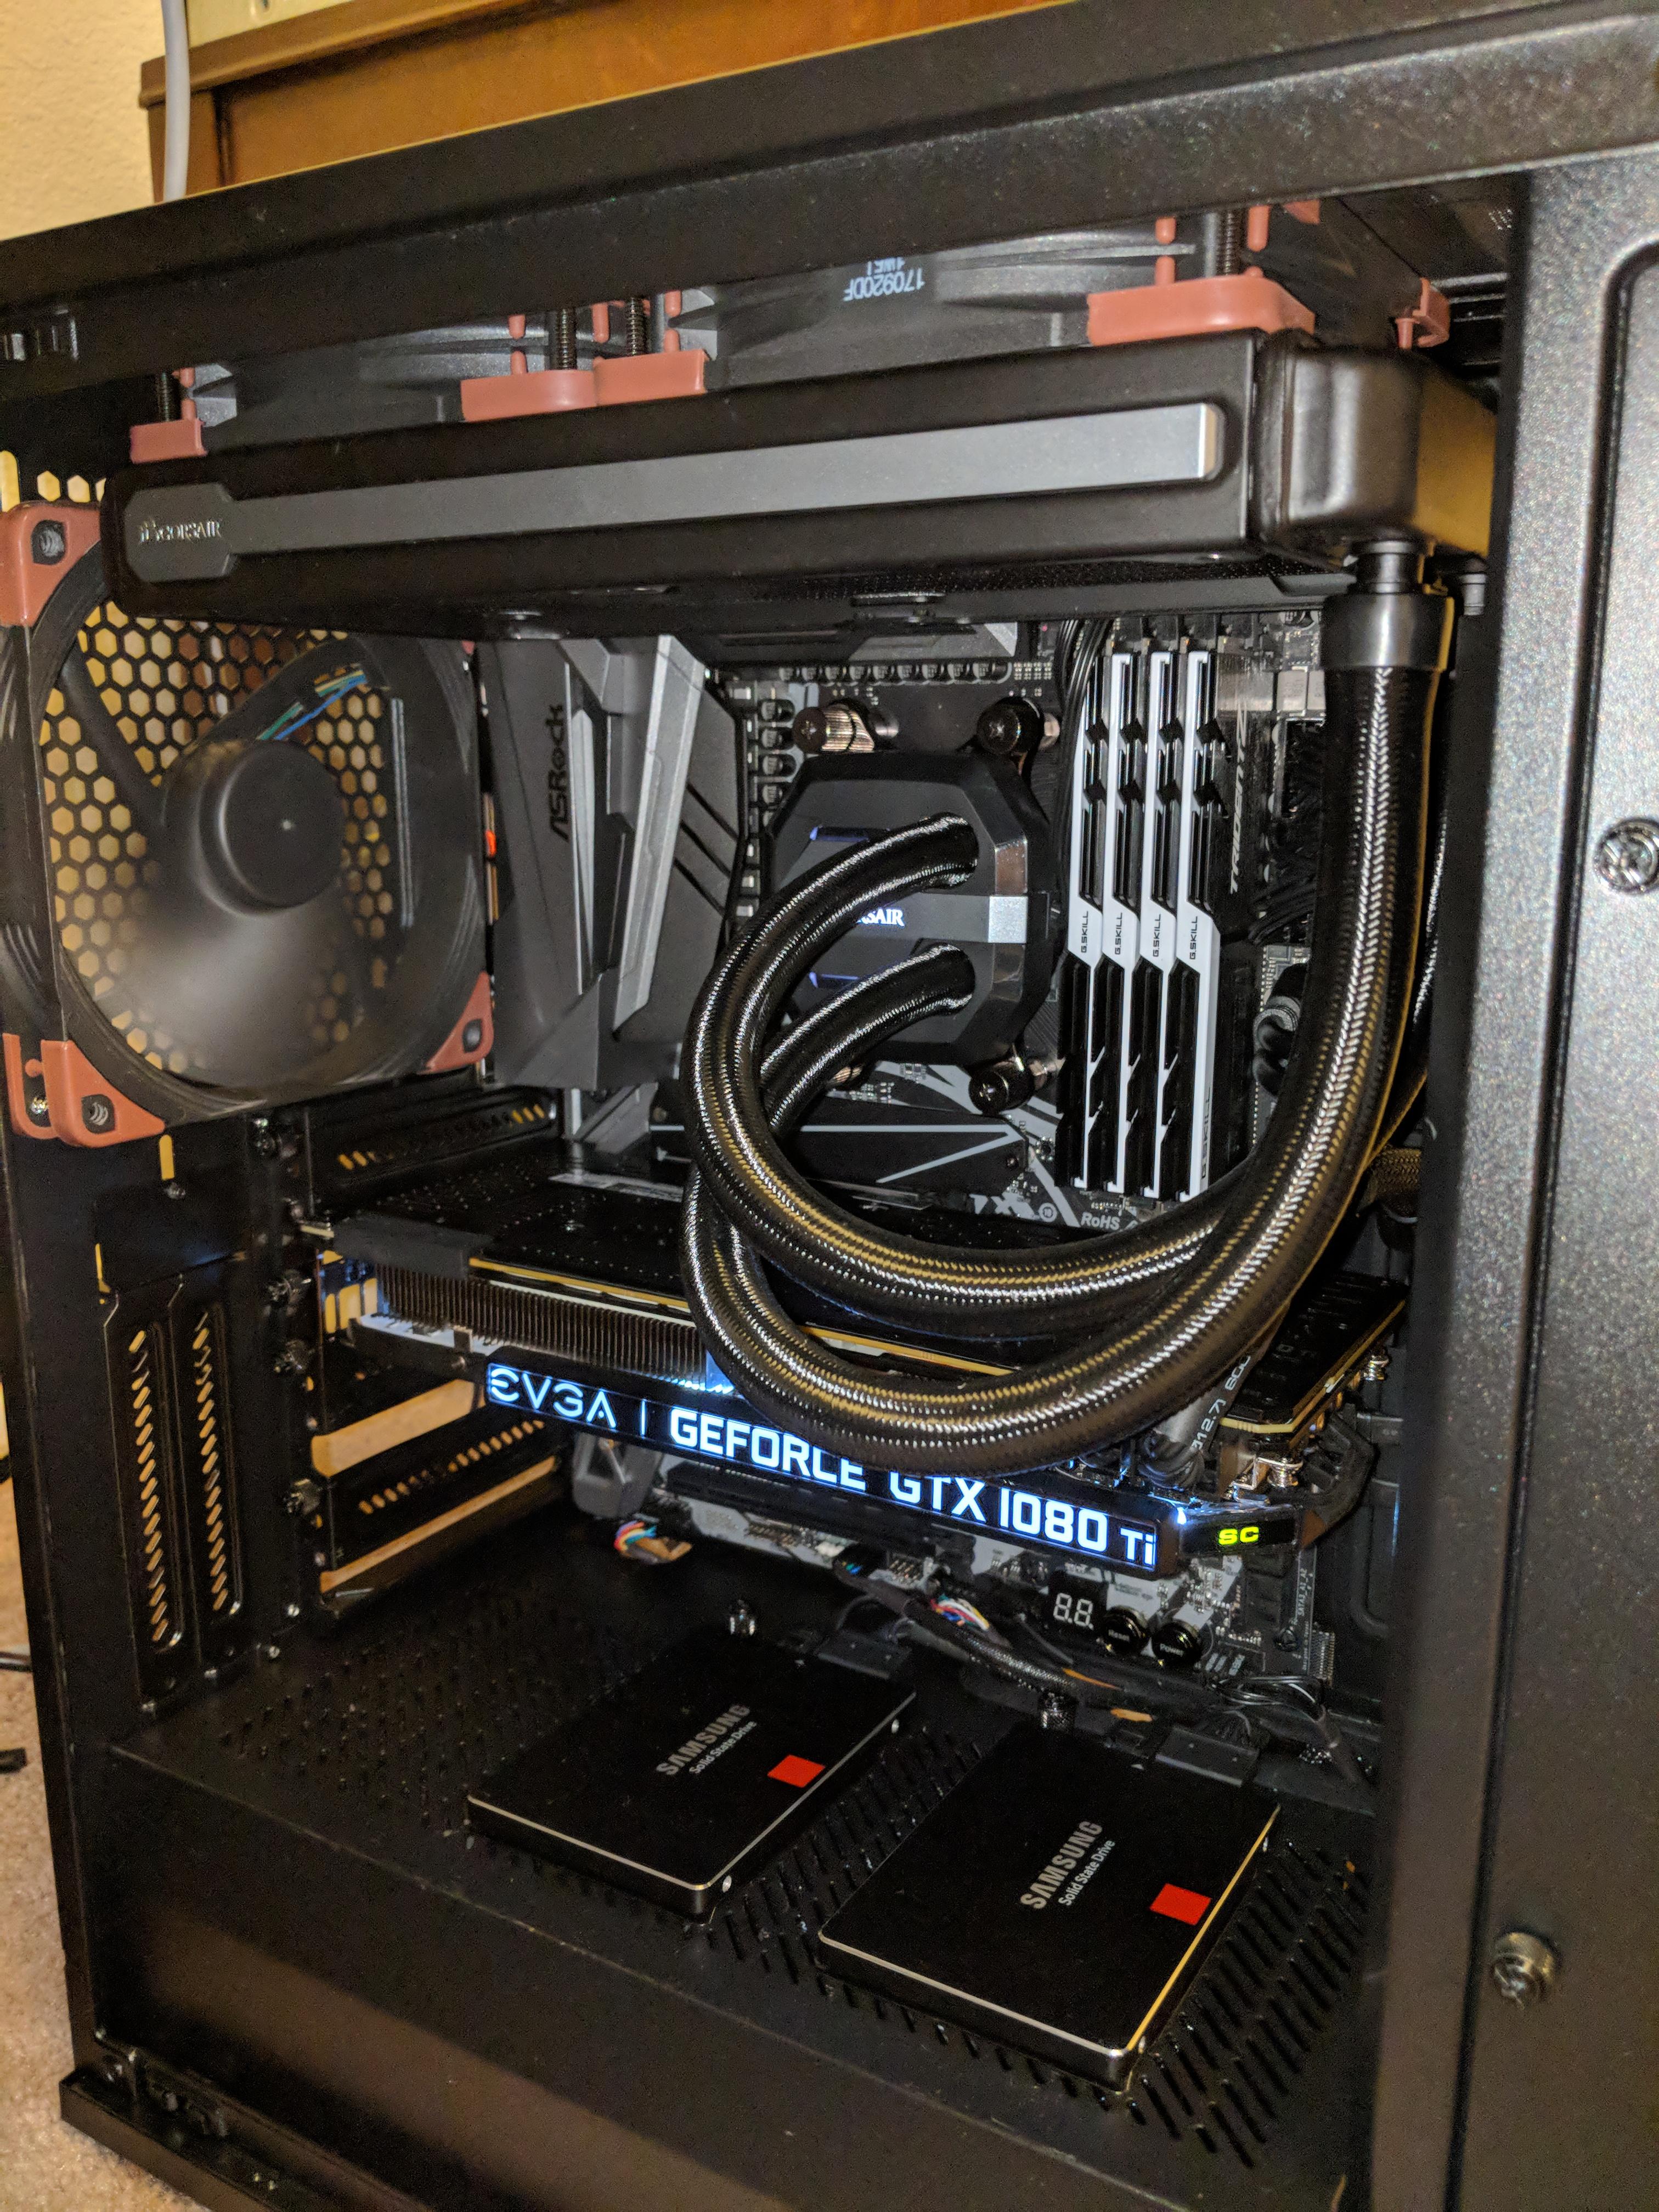 Ryzen Hypervisor Build - x470 Asrock Taichi Ultimate - VFIO